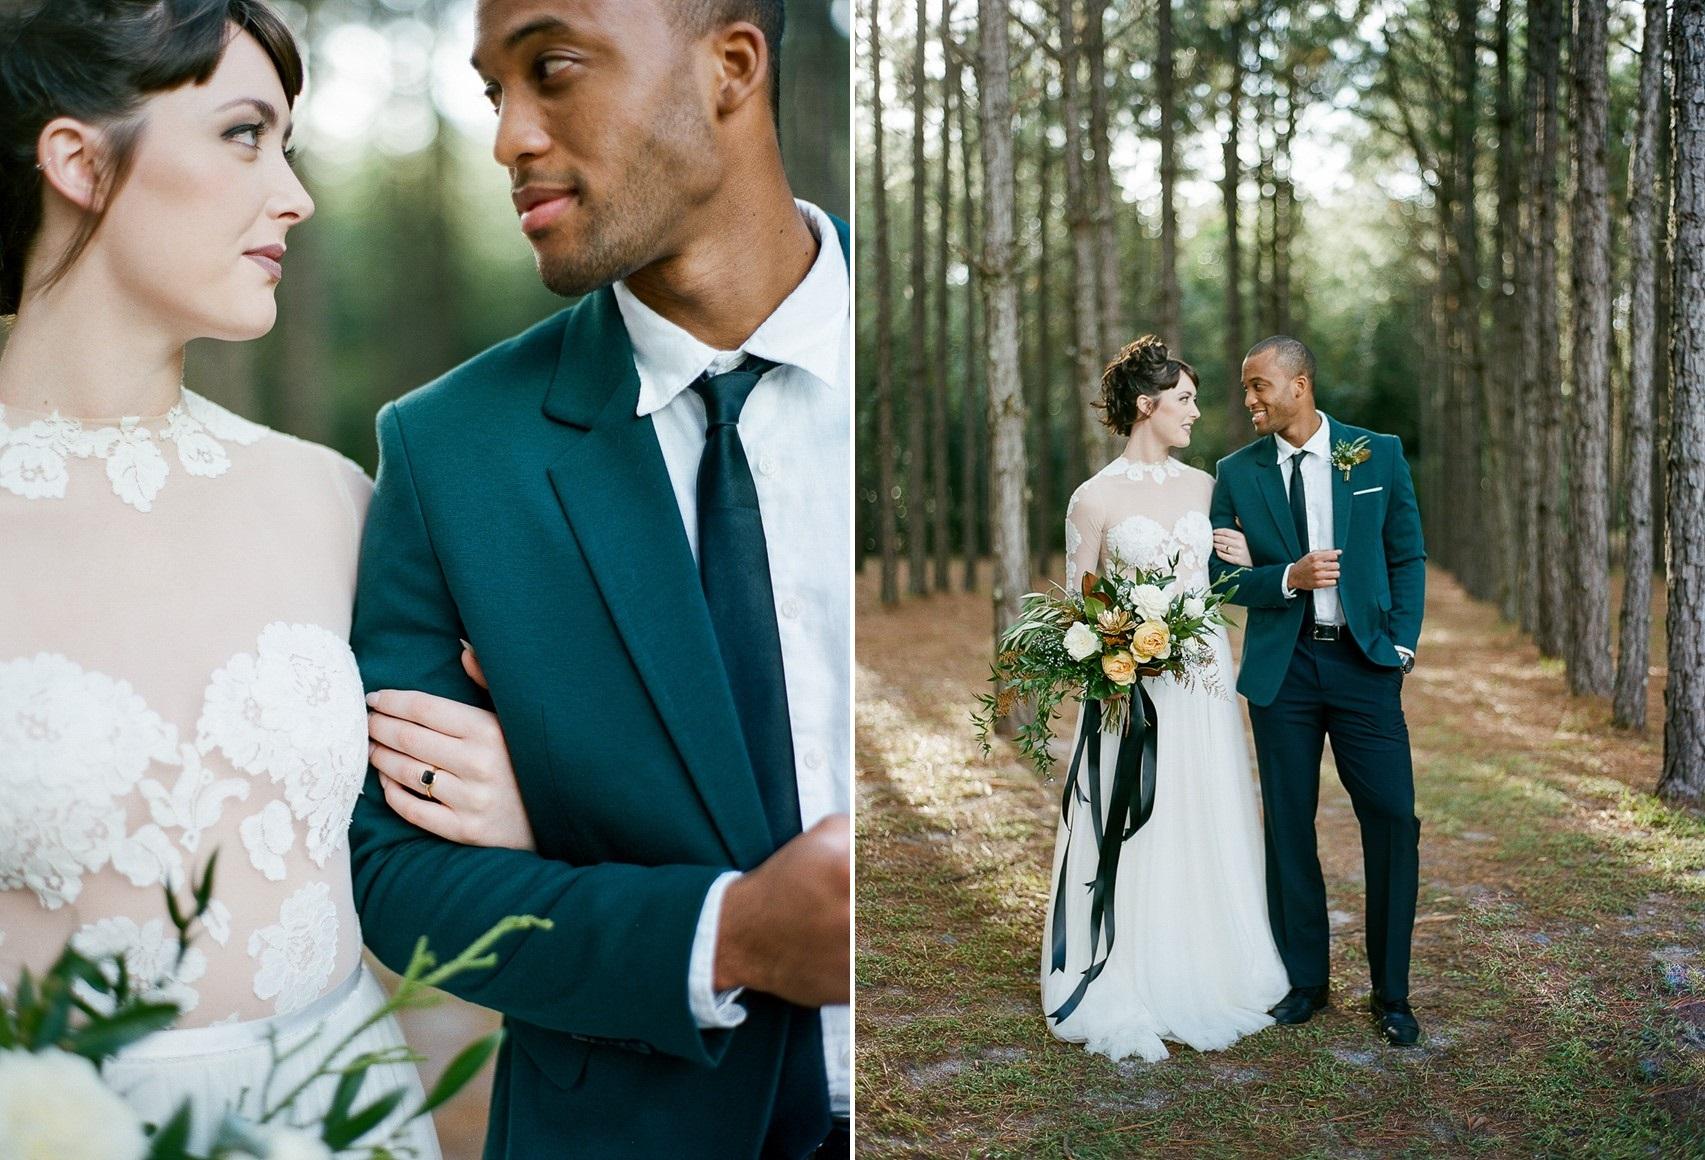 Emerald Green and Gold Wedding Bride & Groom